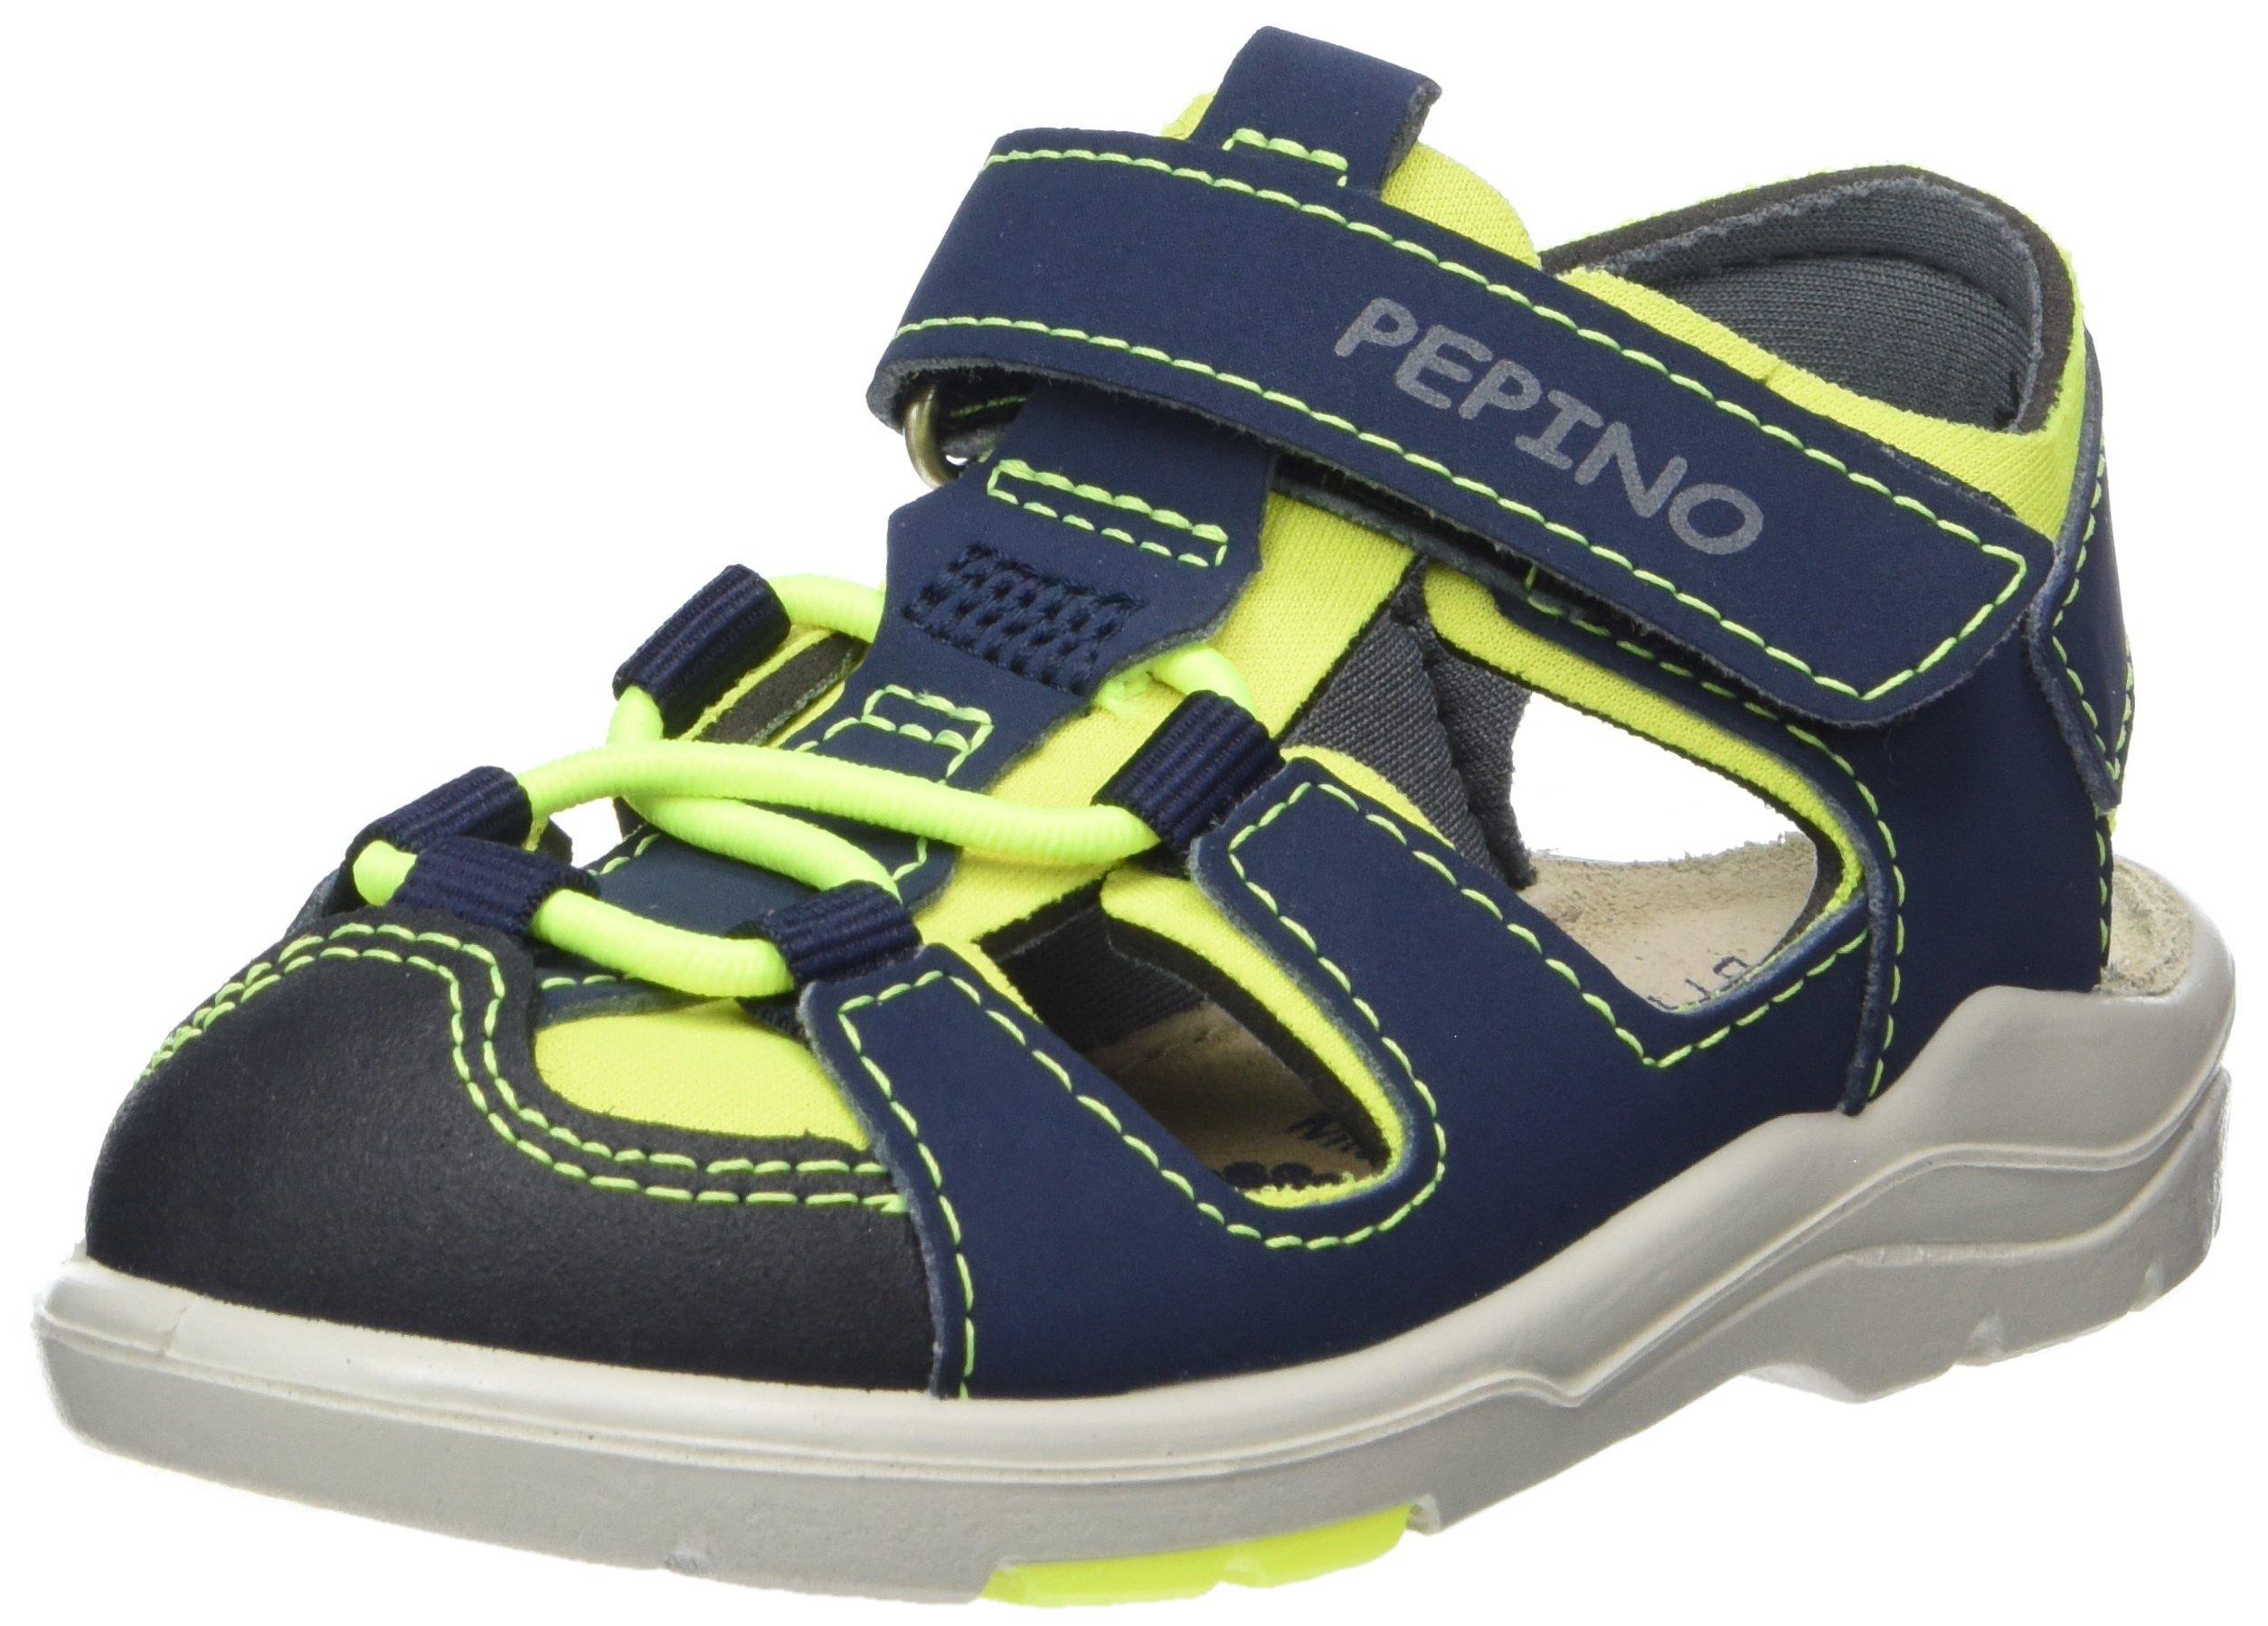 Ricosta Boys' Gery Sandals, Blau (Jeans/Neongelb), 7.5 UK